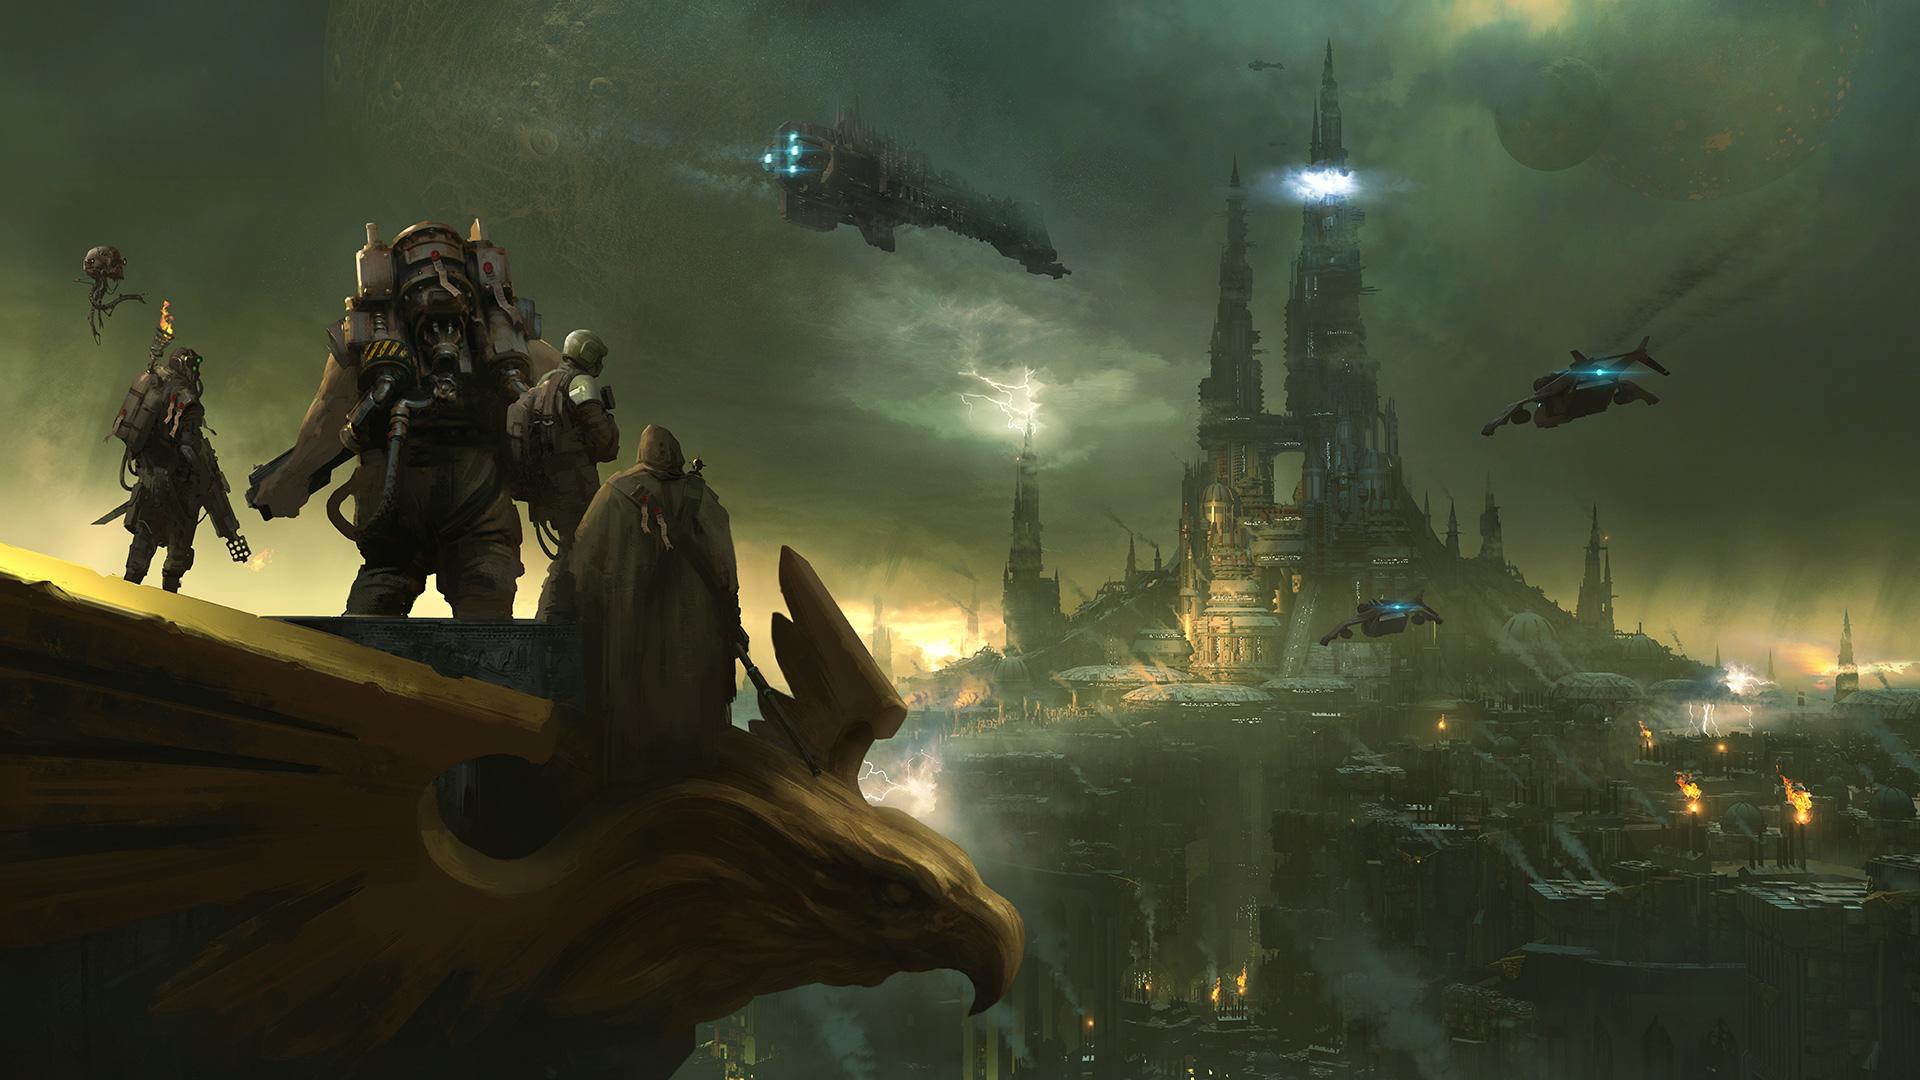 Video For Fatshark Announces Warhammer 40,000: Darktide for Xbox Series X